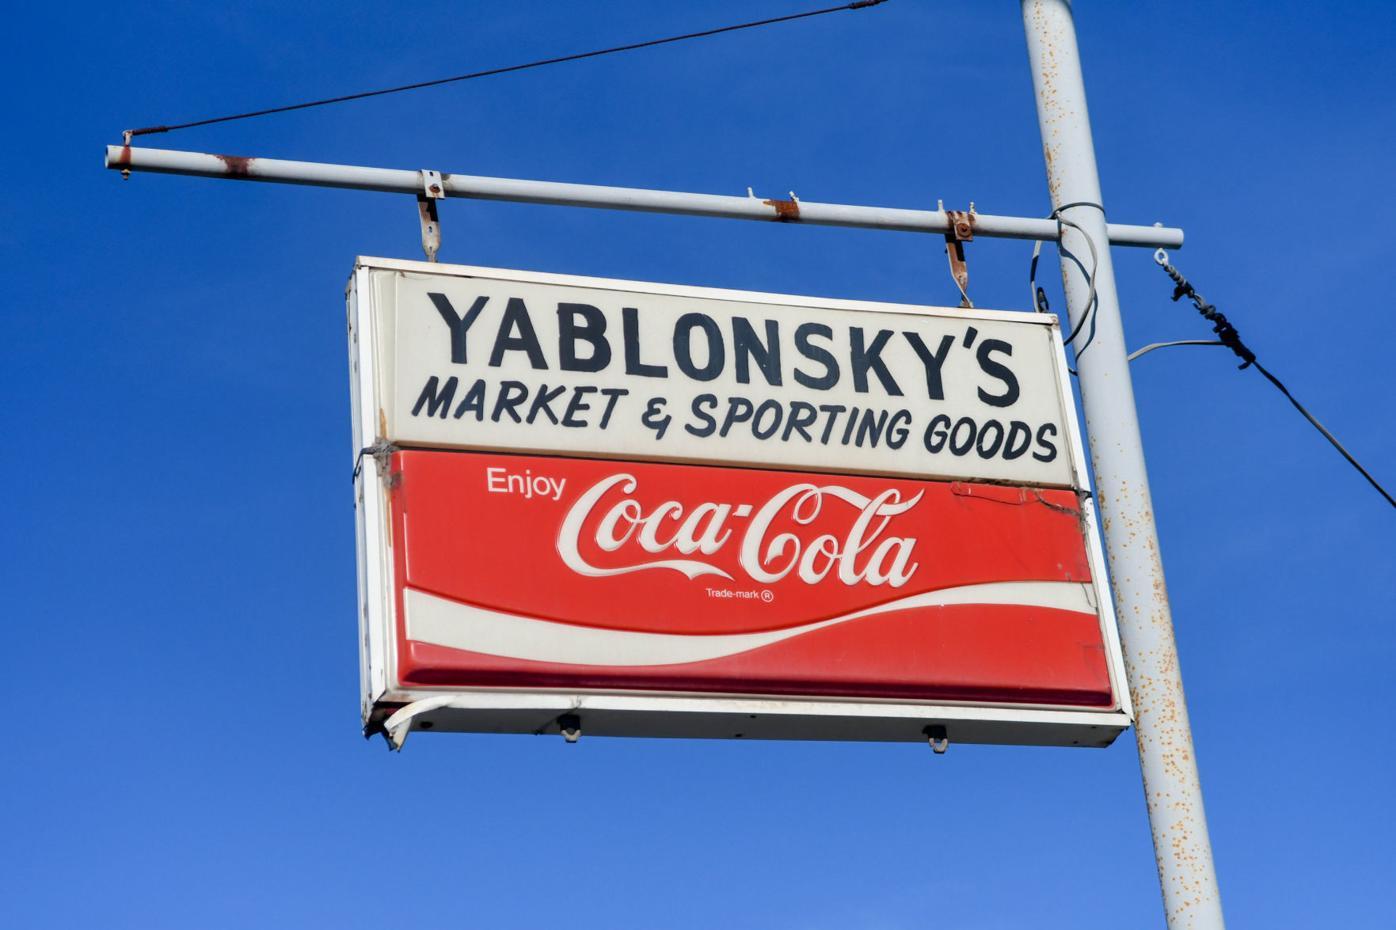 YABLONSKYS